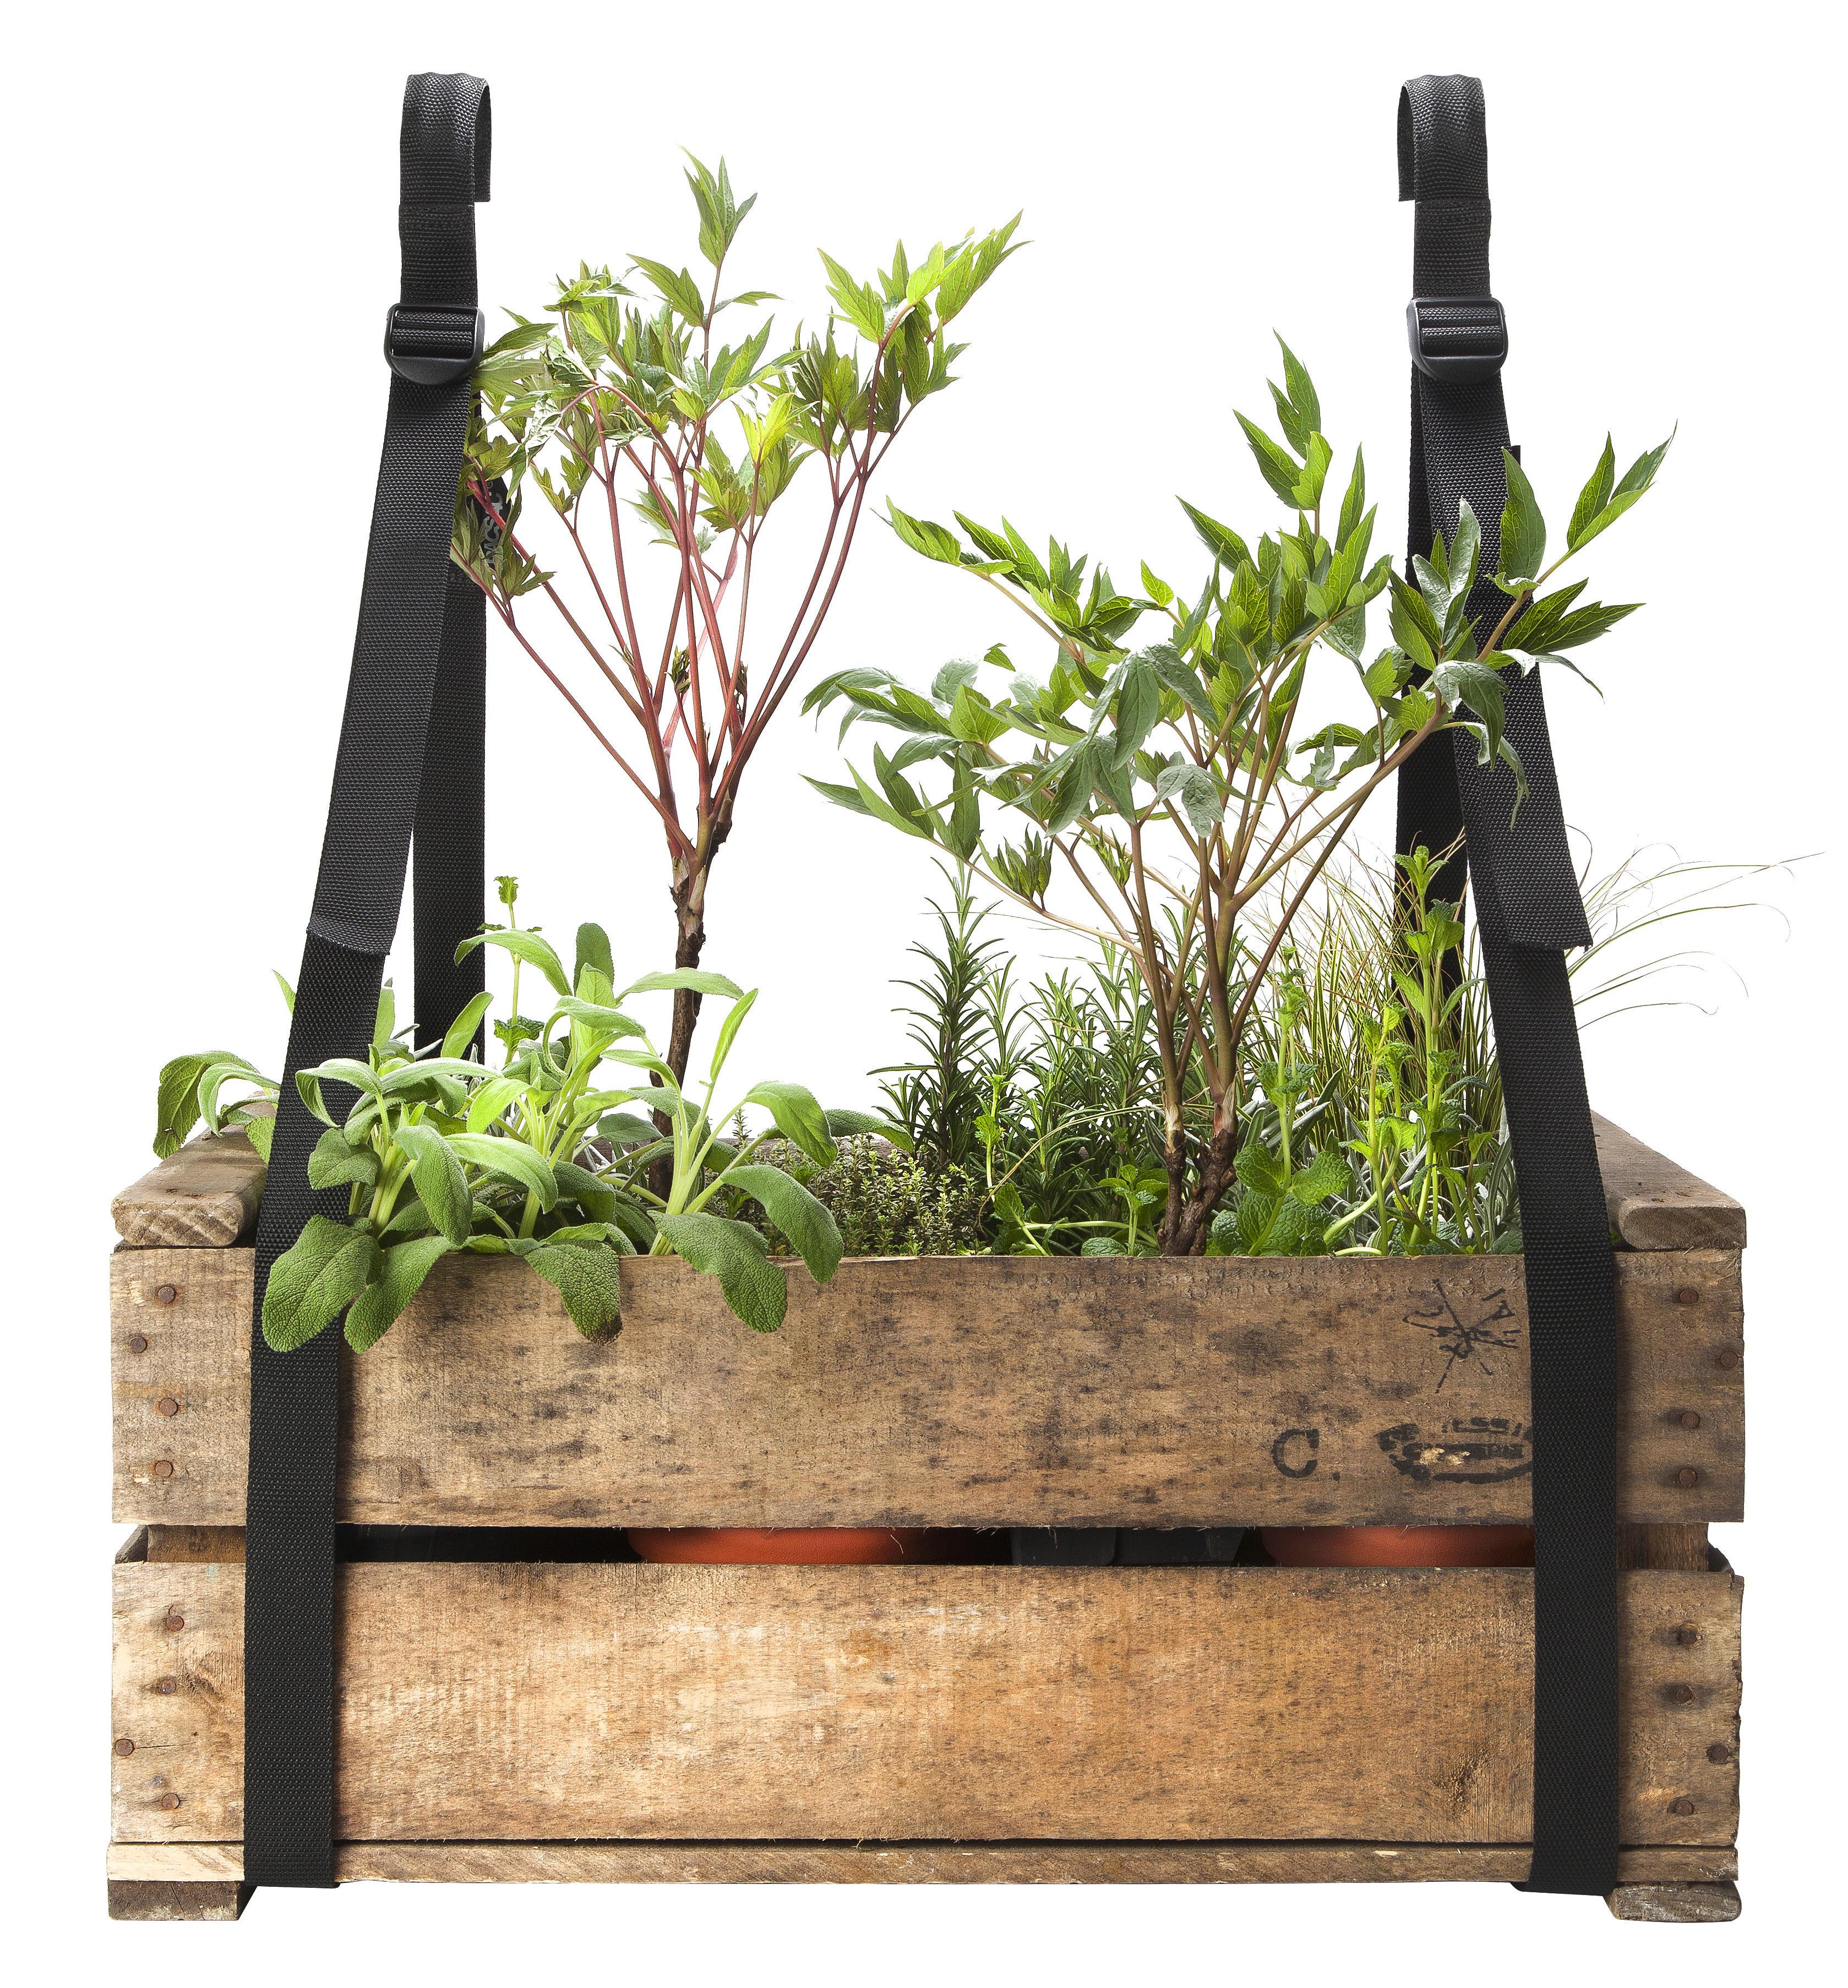 Support jardini re bretelles de balcon set 2 sangles suspension noir bacsac made in design - Support de jardiniere ...